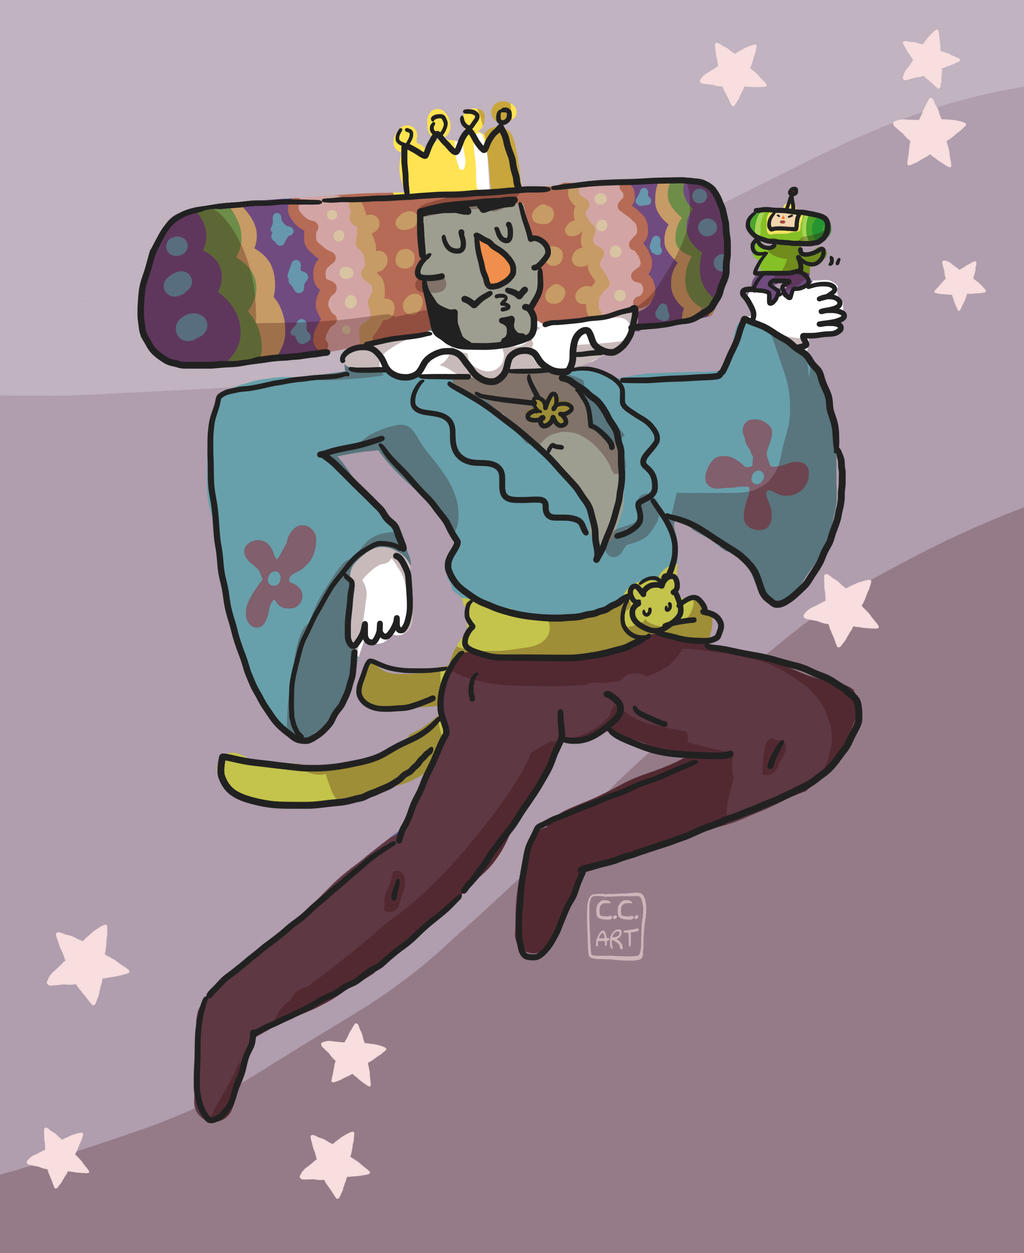 King by ccartstuff